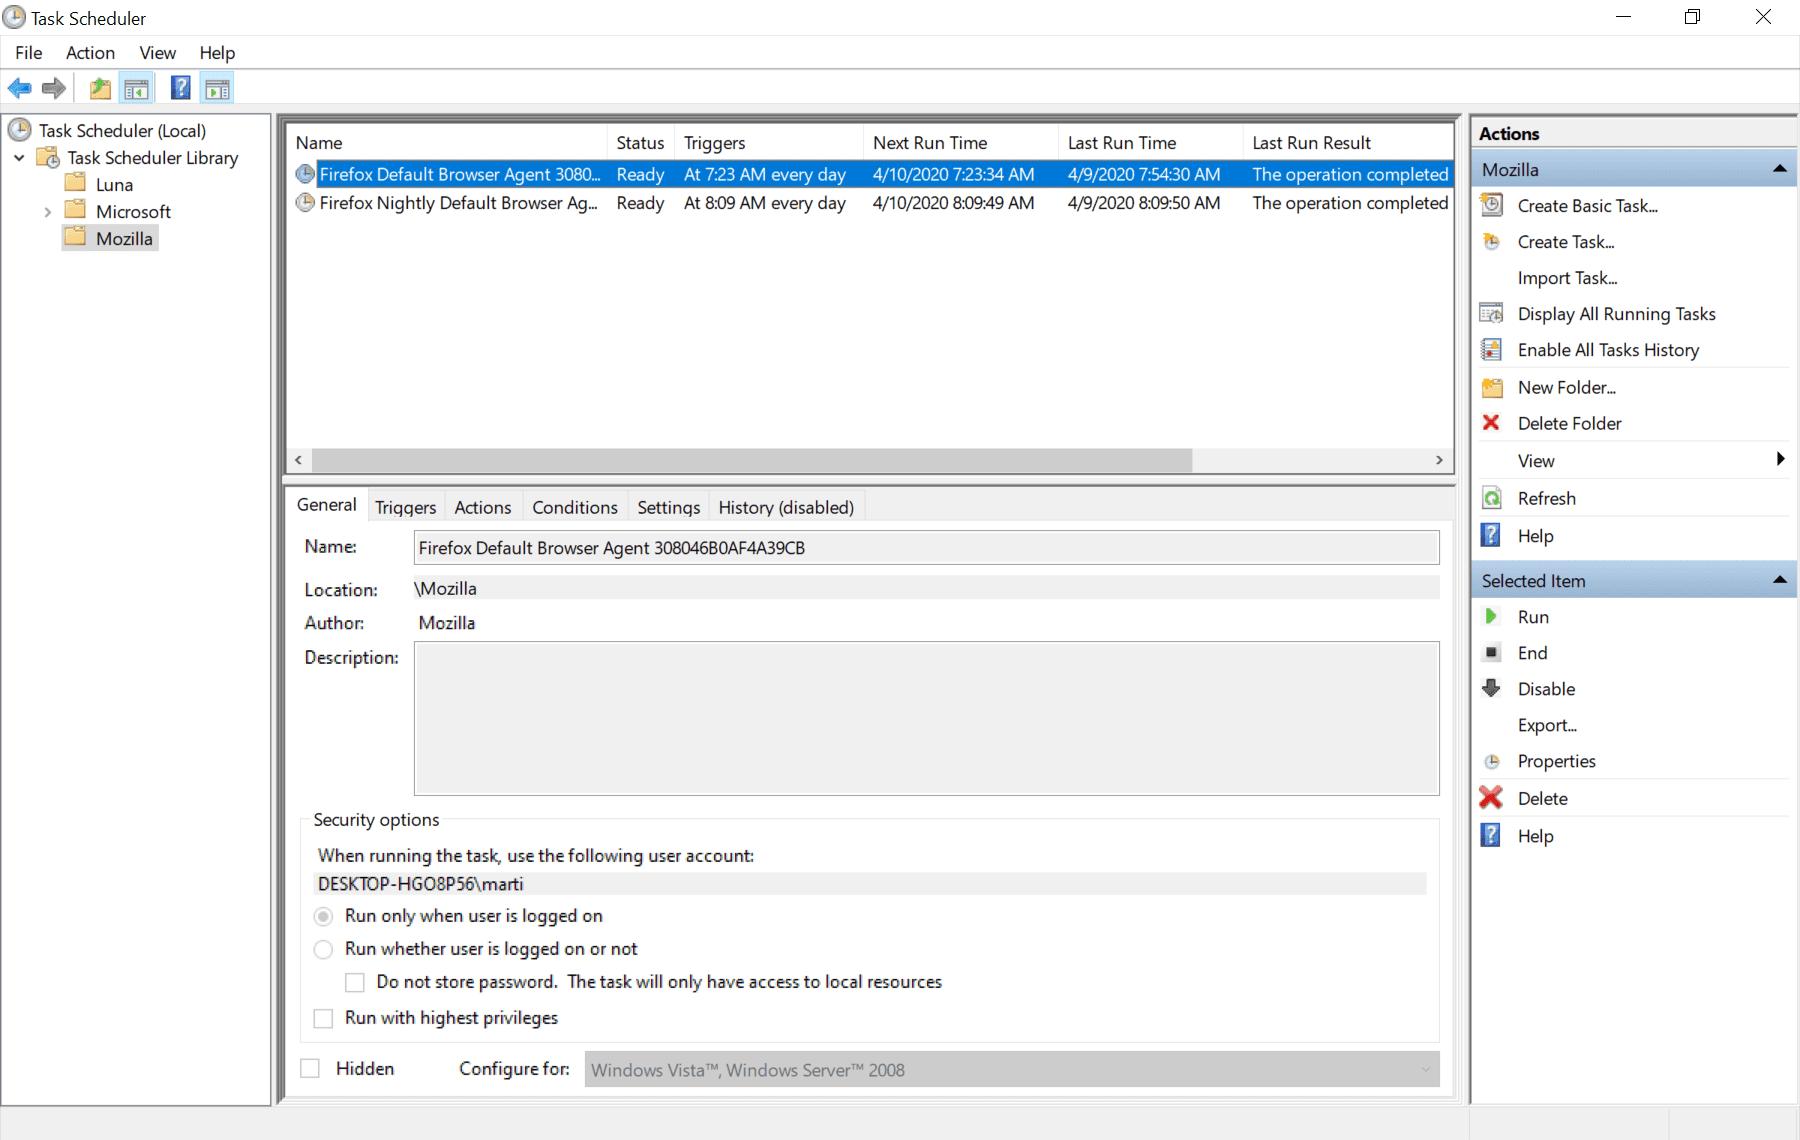 firefox默认浏览器代理